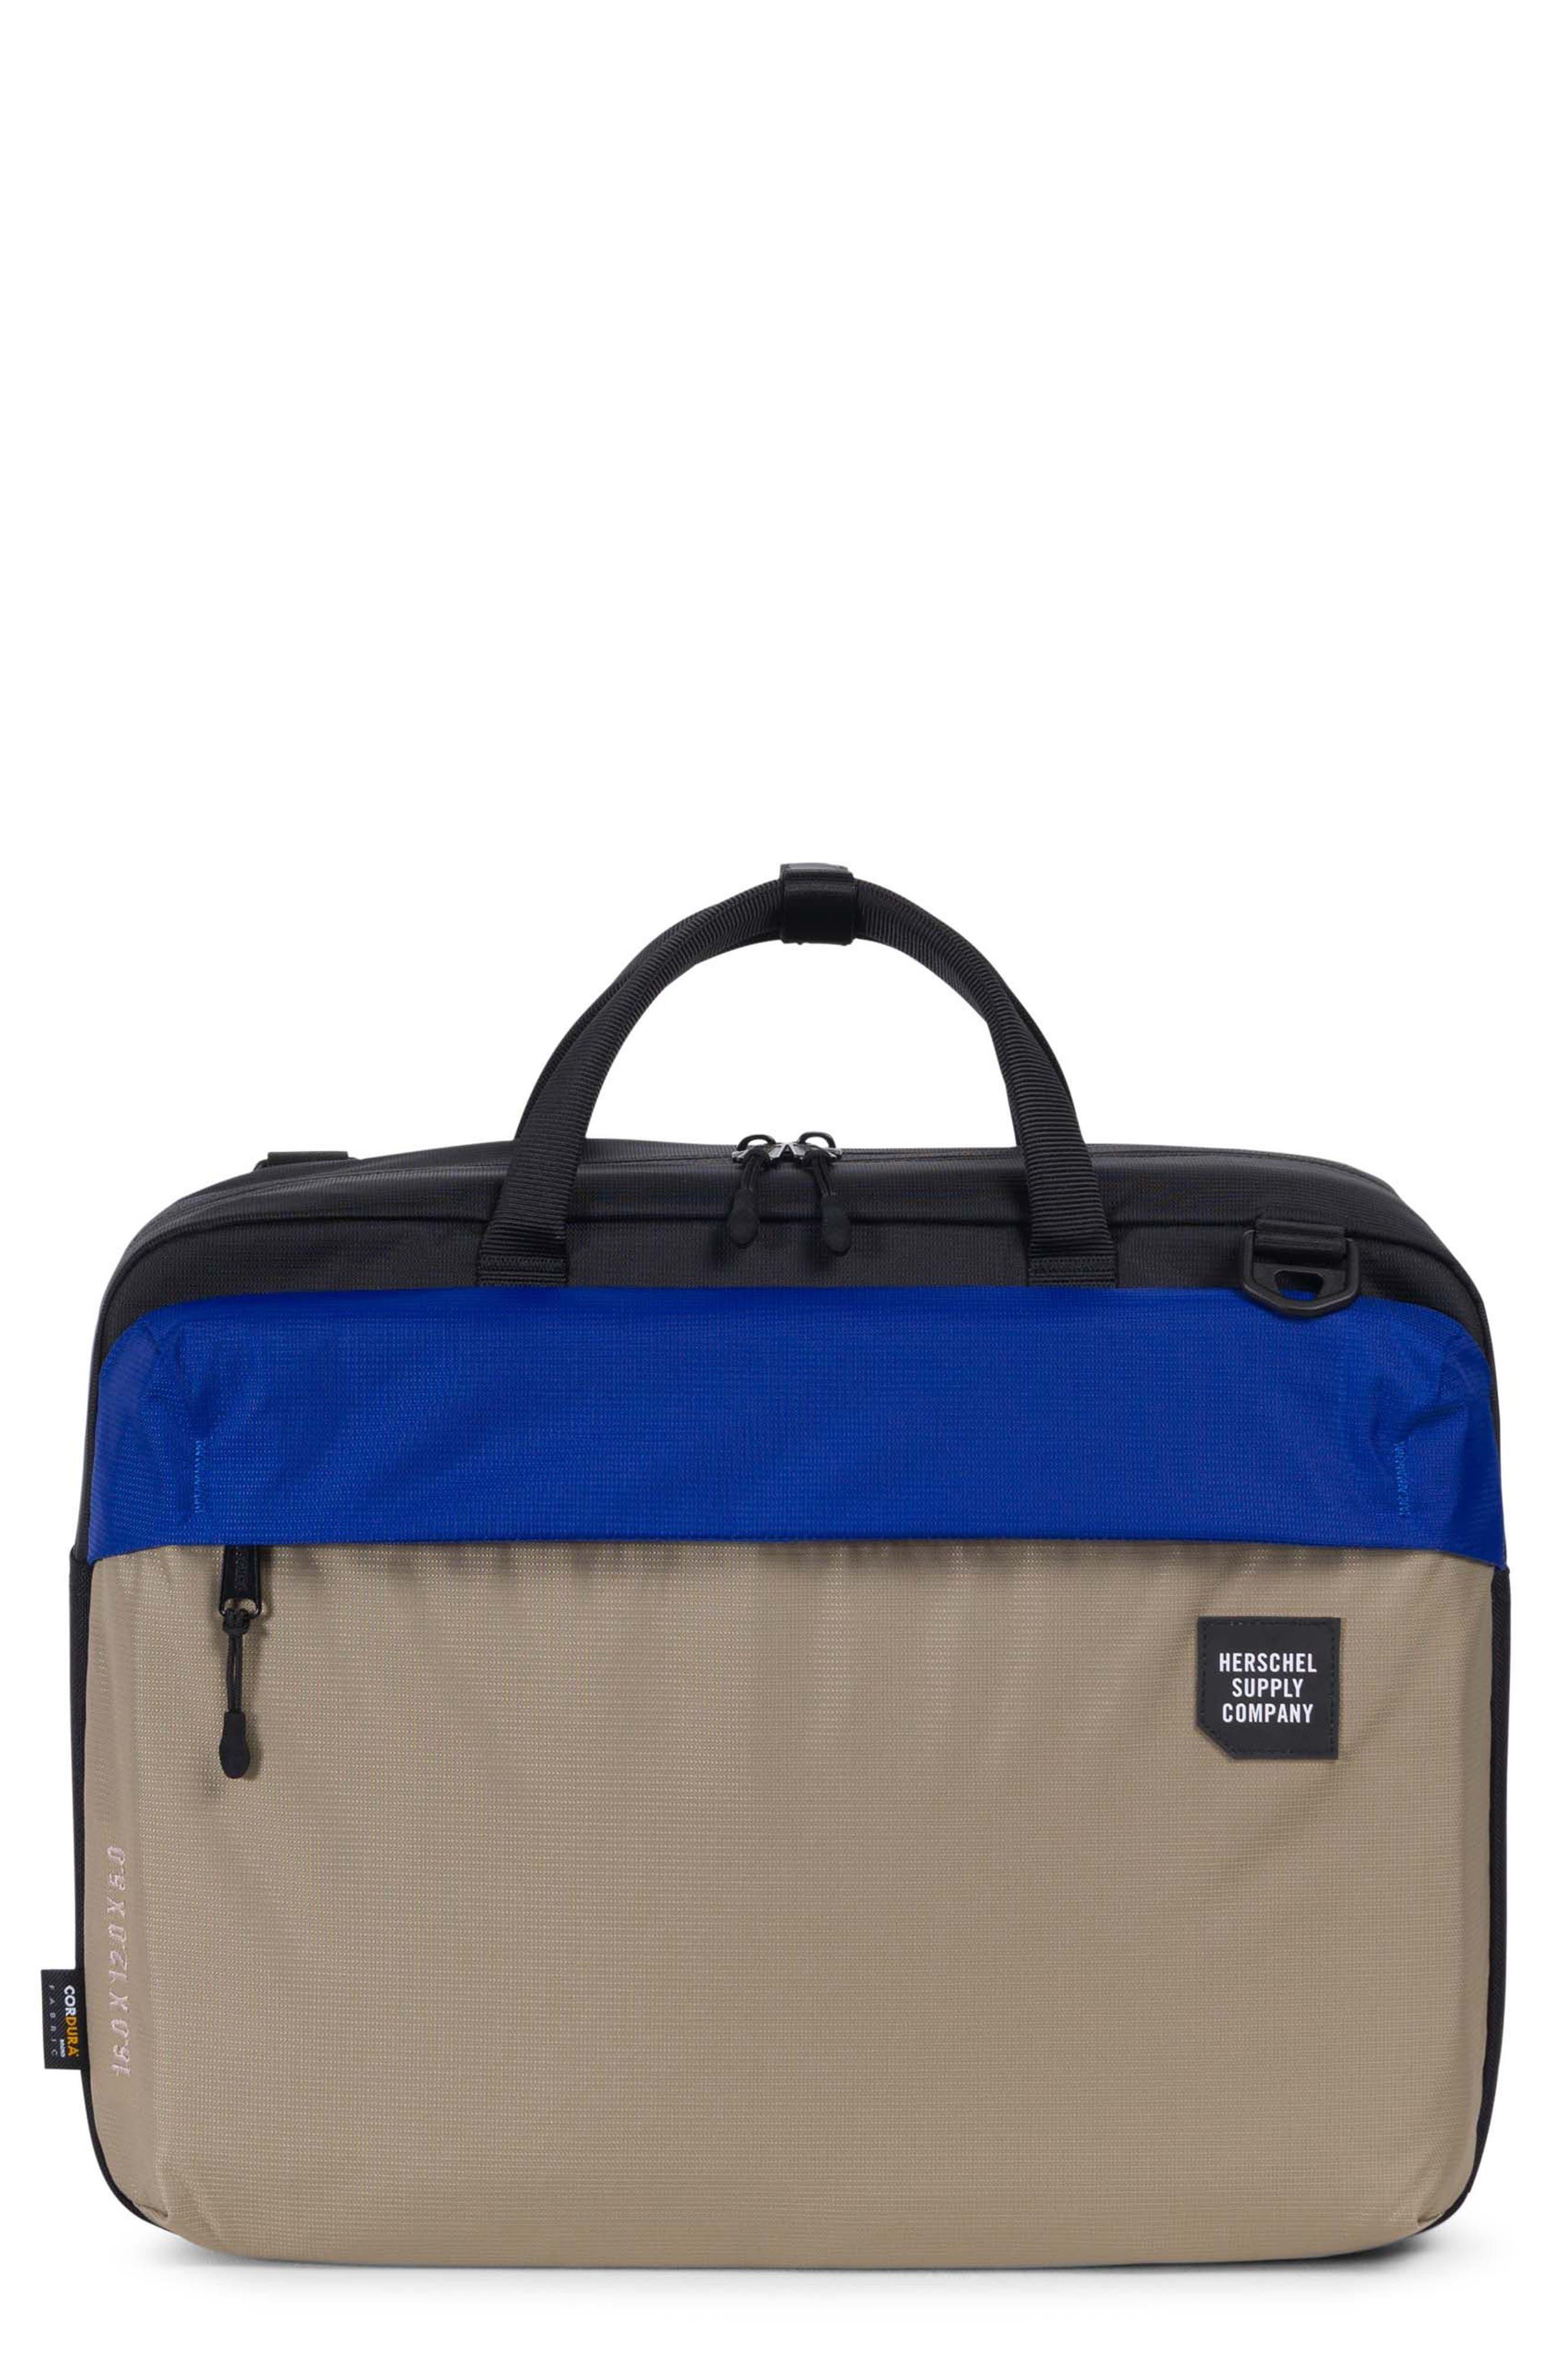 Herschel Supply Co. Britannia Trail Collection Convertible Messenger Bag